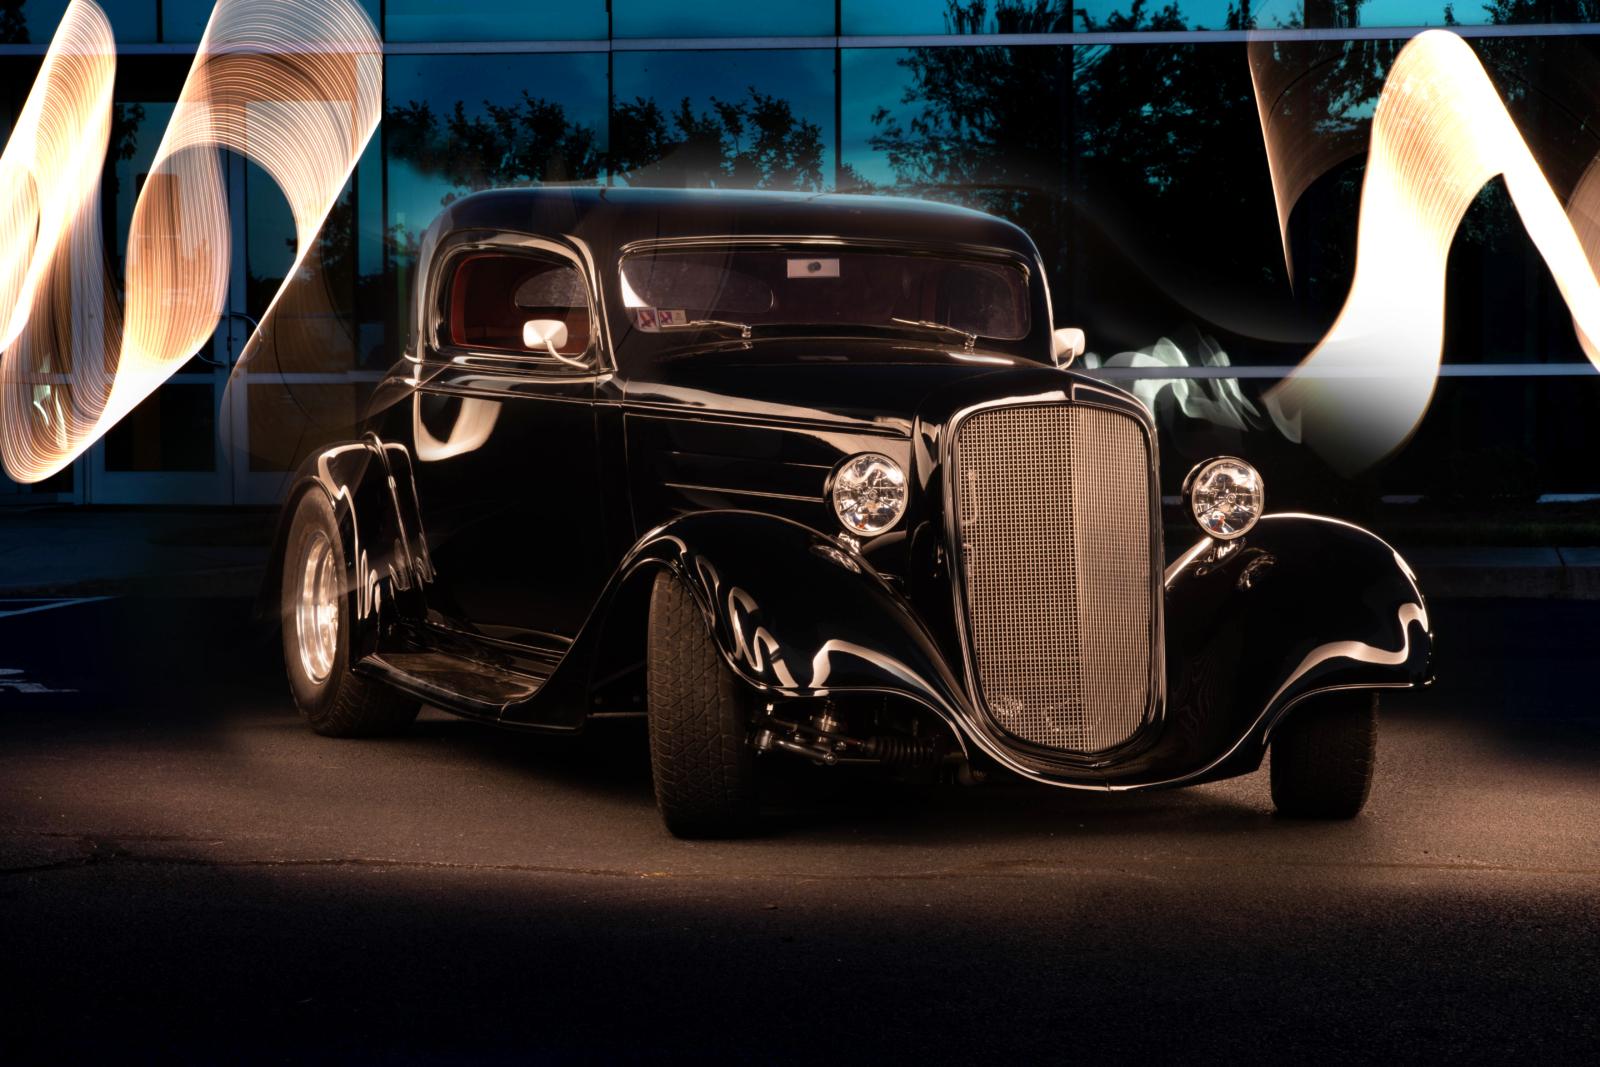 Custom Auto Upholstery | 1934 Chevrolet Coupe Interior